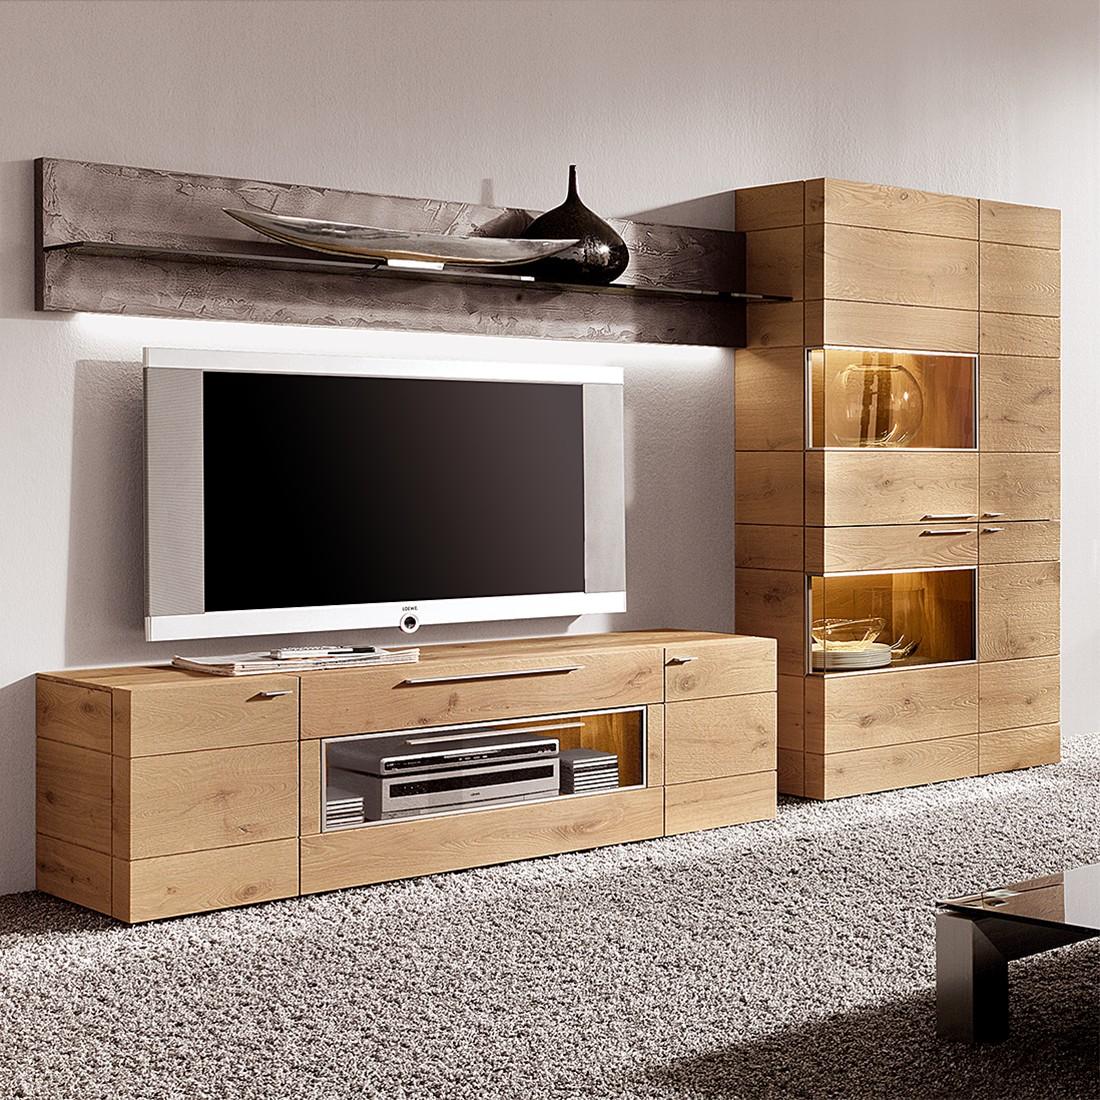 wohnwand massiv eiche sonstige preisvergleiche. Black Bedroom Furniture Sets. Home Design Ideas